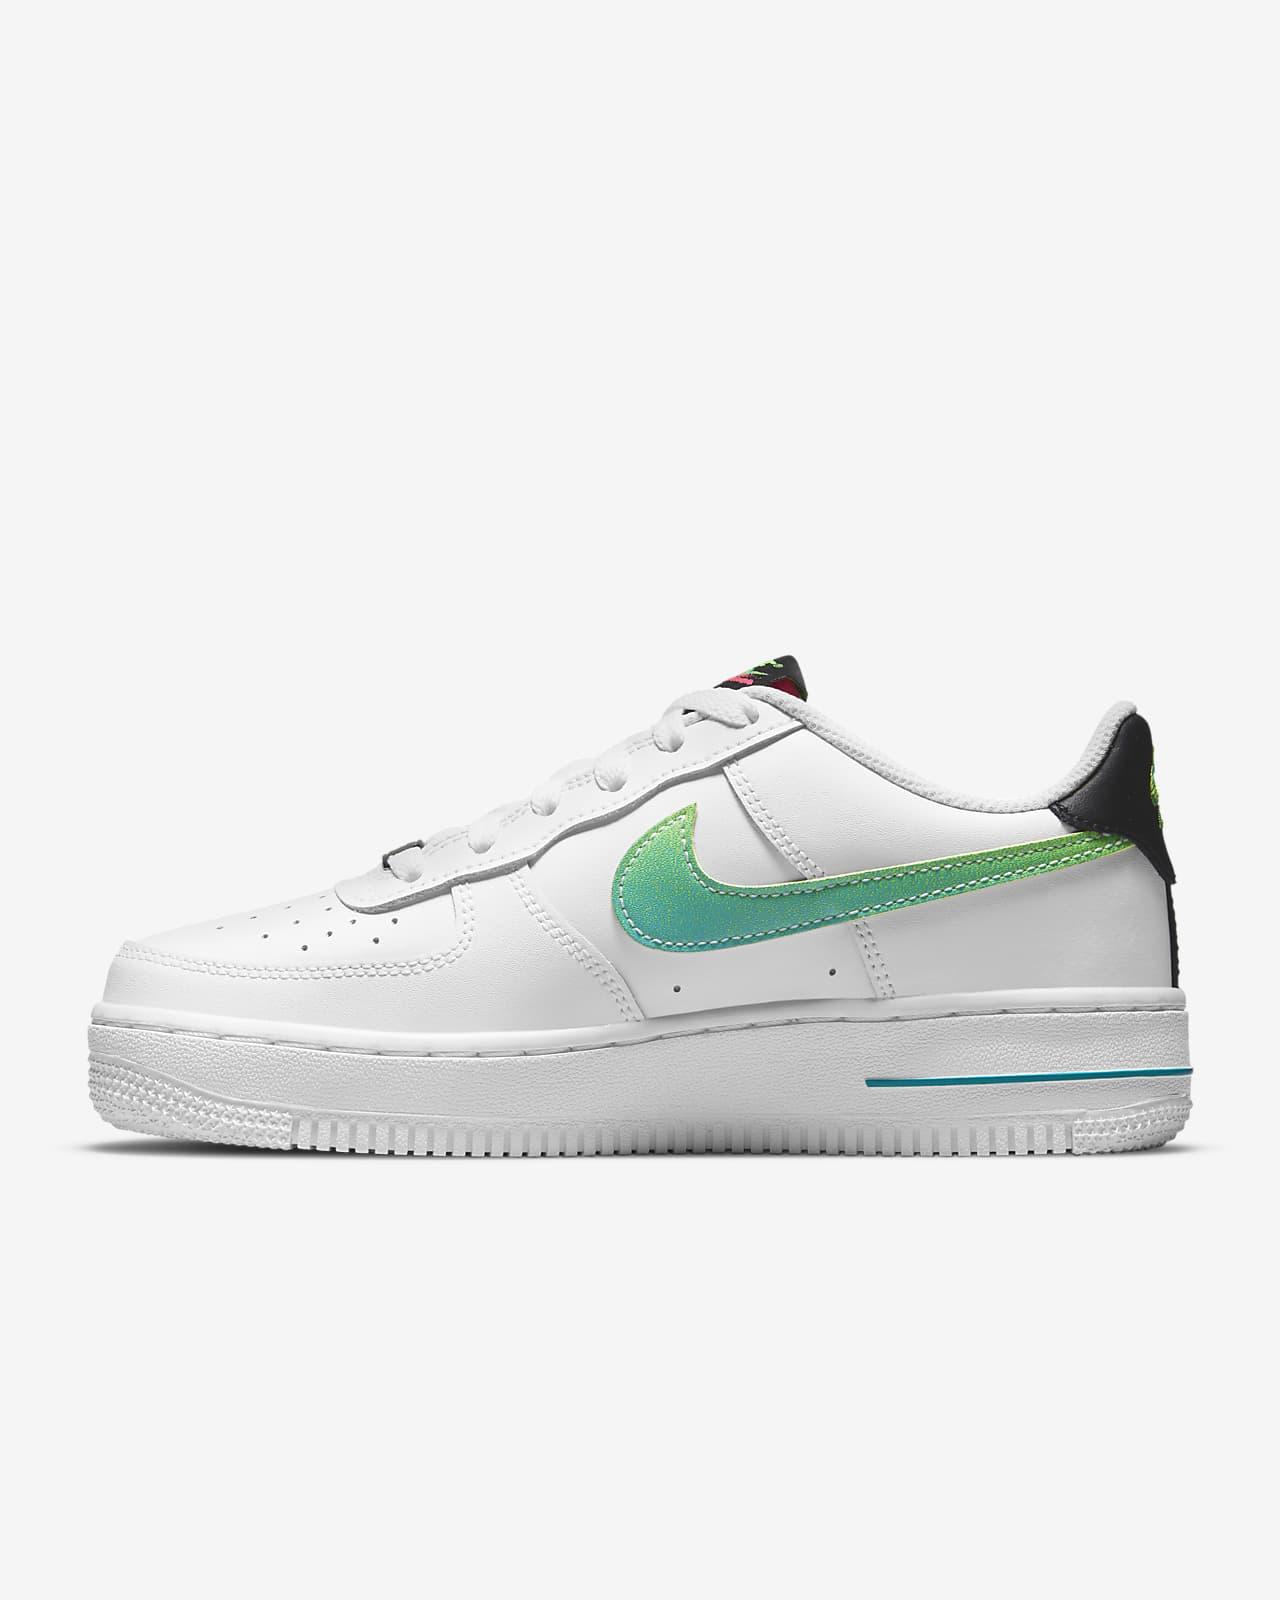 Nike Air Force 1 LV8 1 Older Kids' Shoe